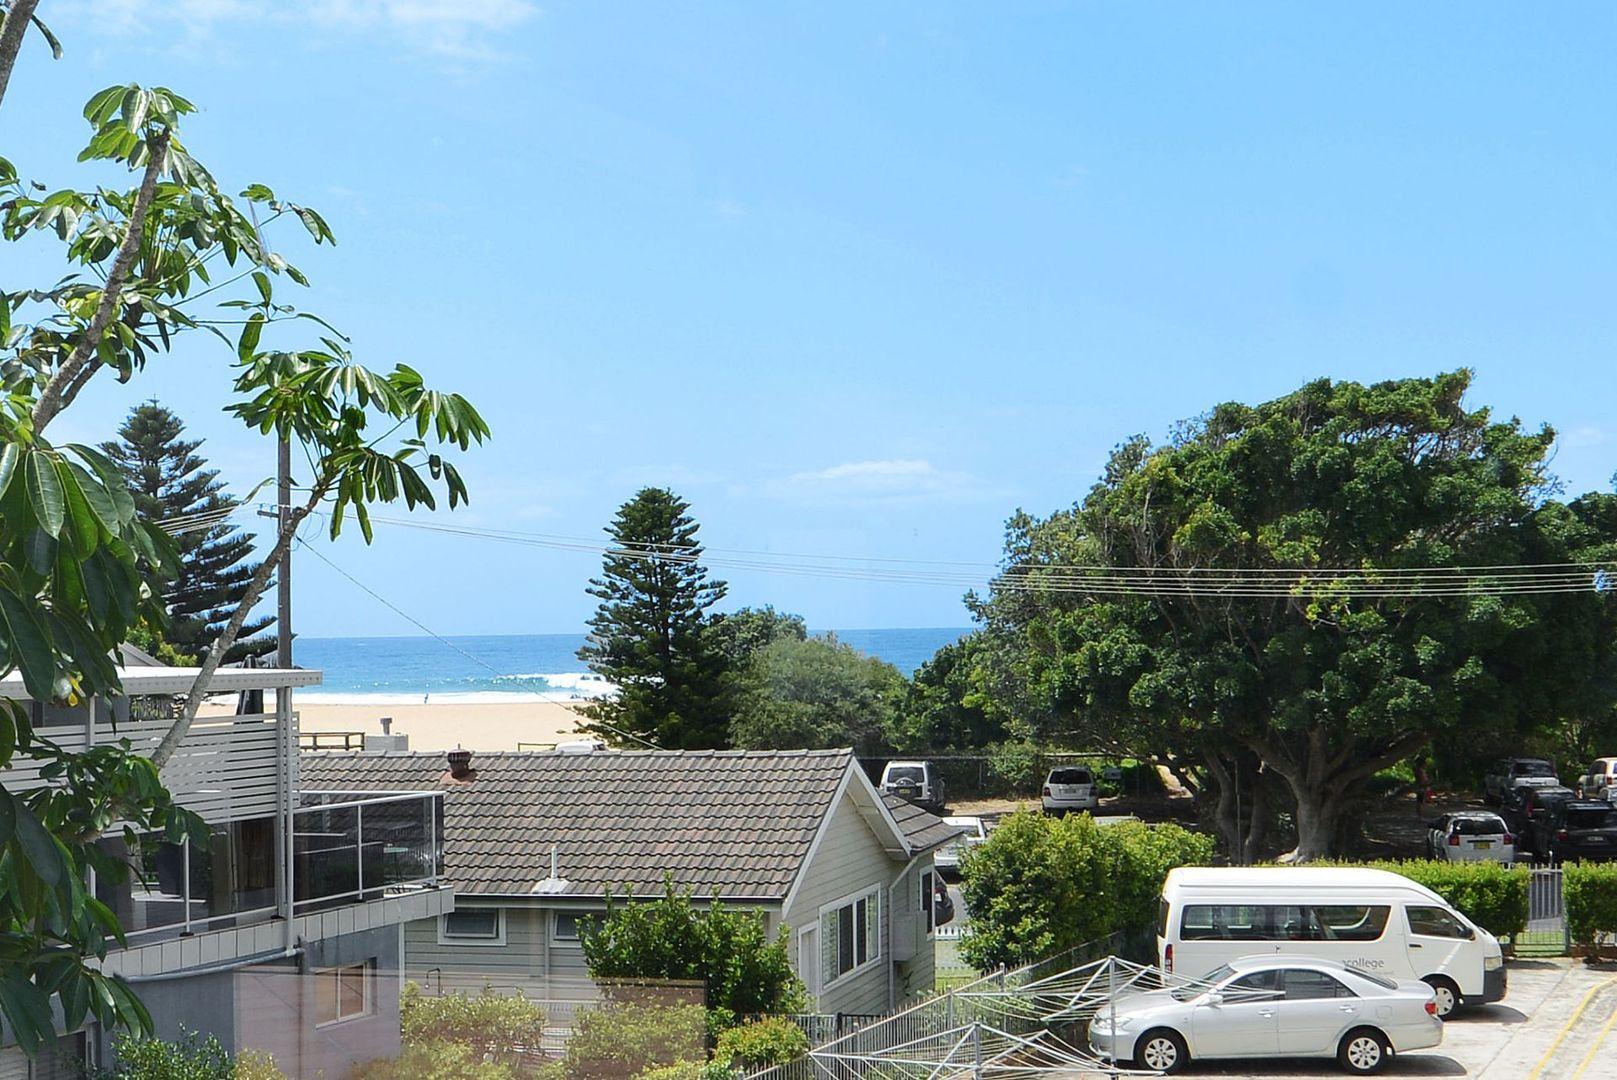 3/177 Avoca Dr, Avoca Beach NSW 2251, Image 0